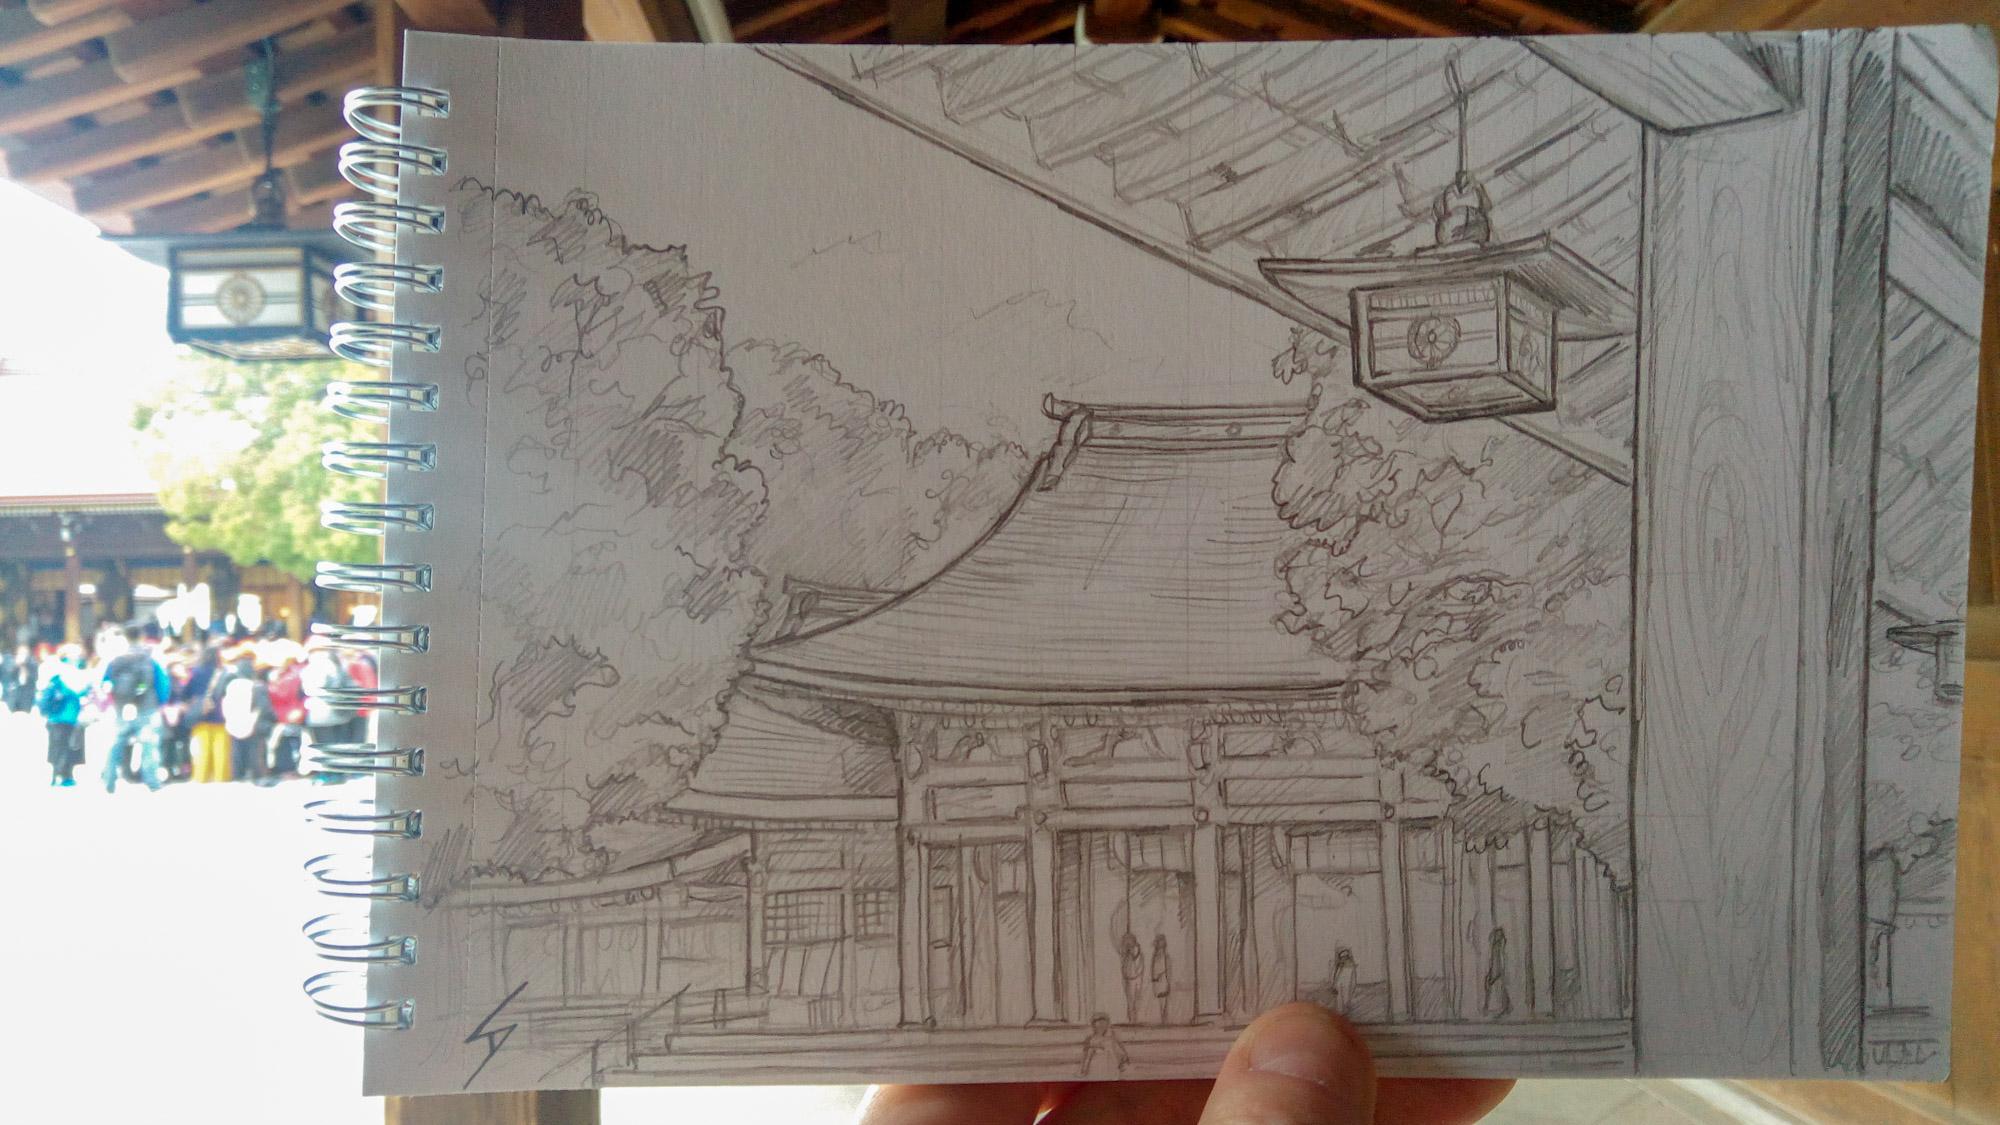 Urban photo art - Shibuya, Tokyo, Japan. 'Meiji Shrine.' The original buildings were destroyed in WW2, though it was impressively restored by public fundraising in 1958. sketchbookexplorer.com @davidasutton @sketchbookexplorer Facebook.com/davidanthonysutton #japan #tokyo #taito #meijishrine #travel #travelblog #art #sketching #cheeryblossom #cherryblossomseason #cherryblossomjapan